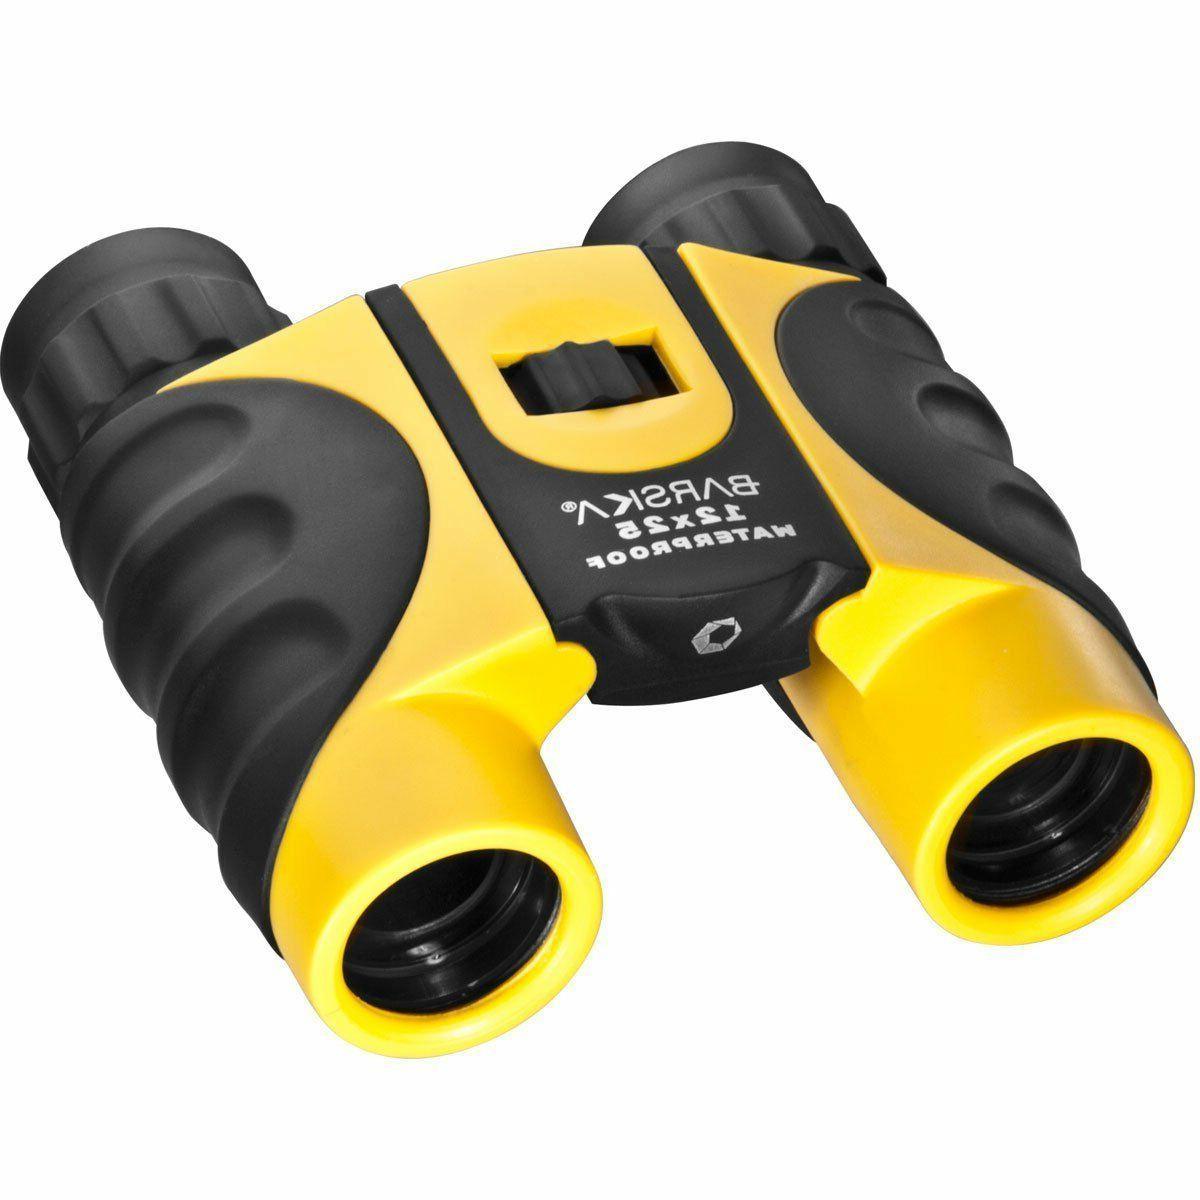 waterproof colorado binoculars durable yellow